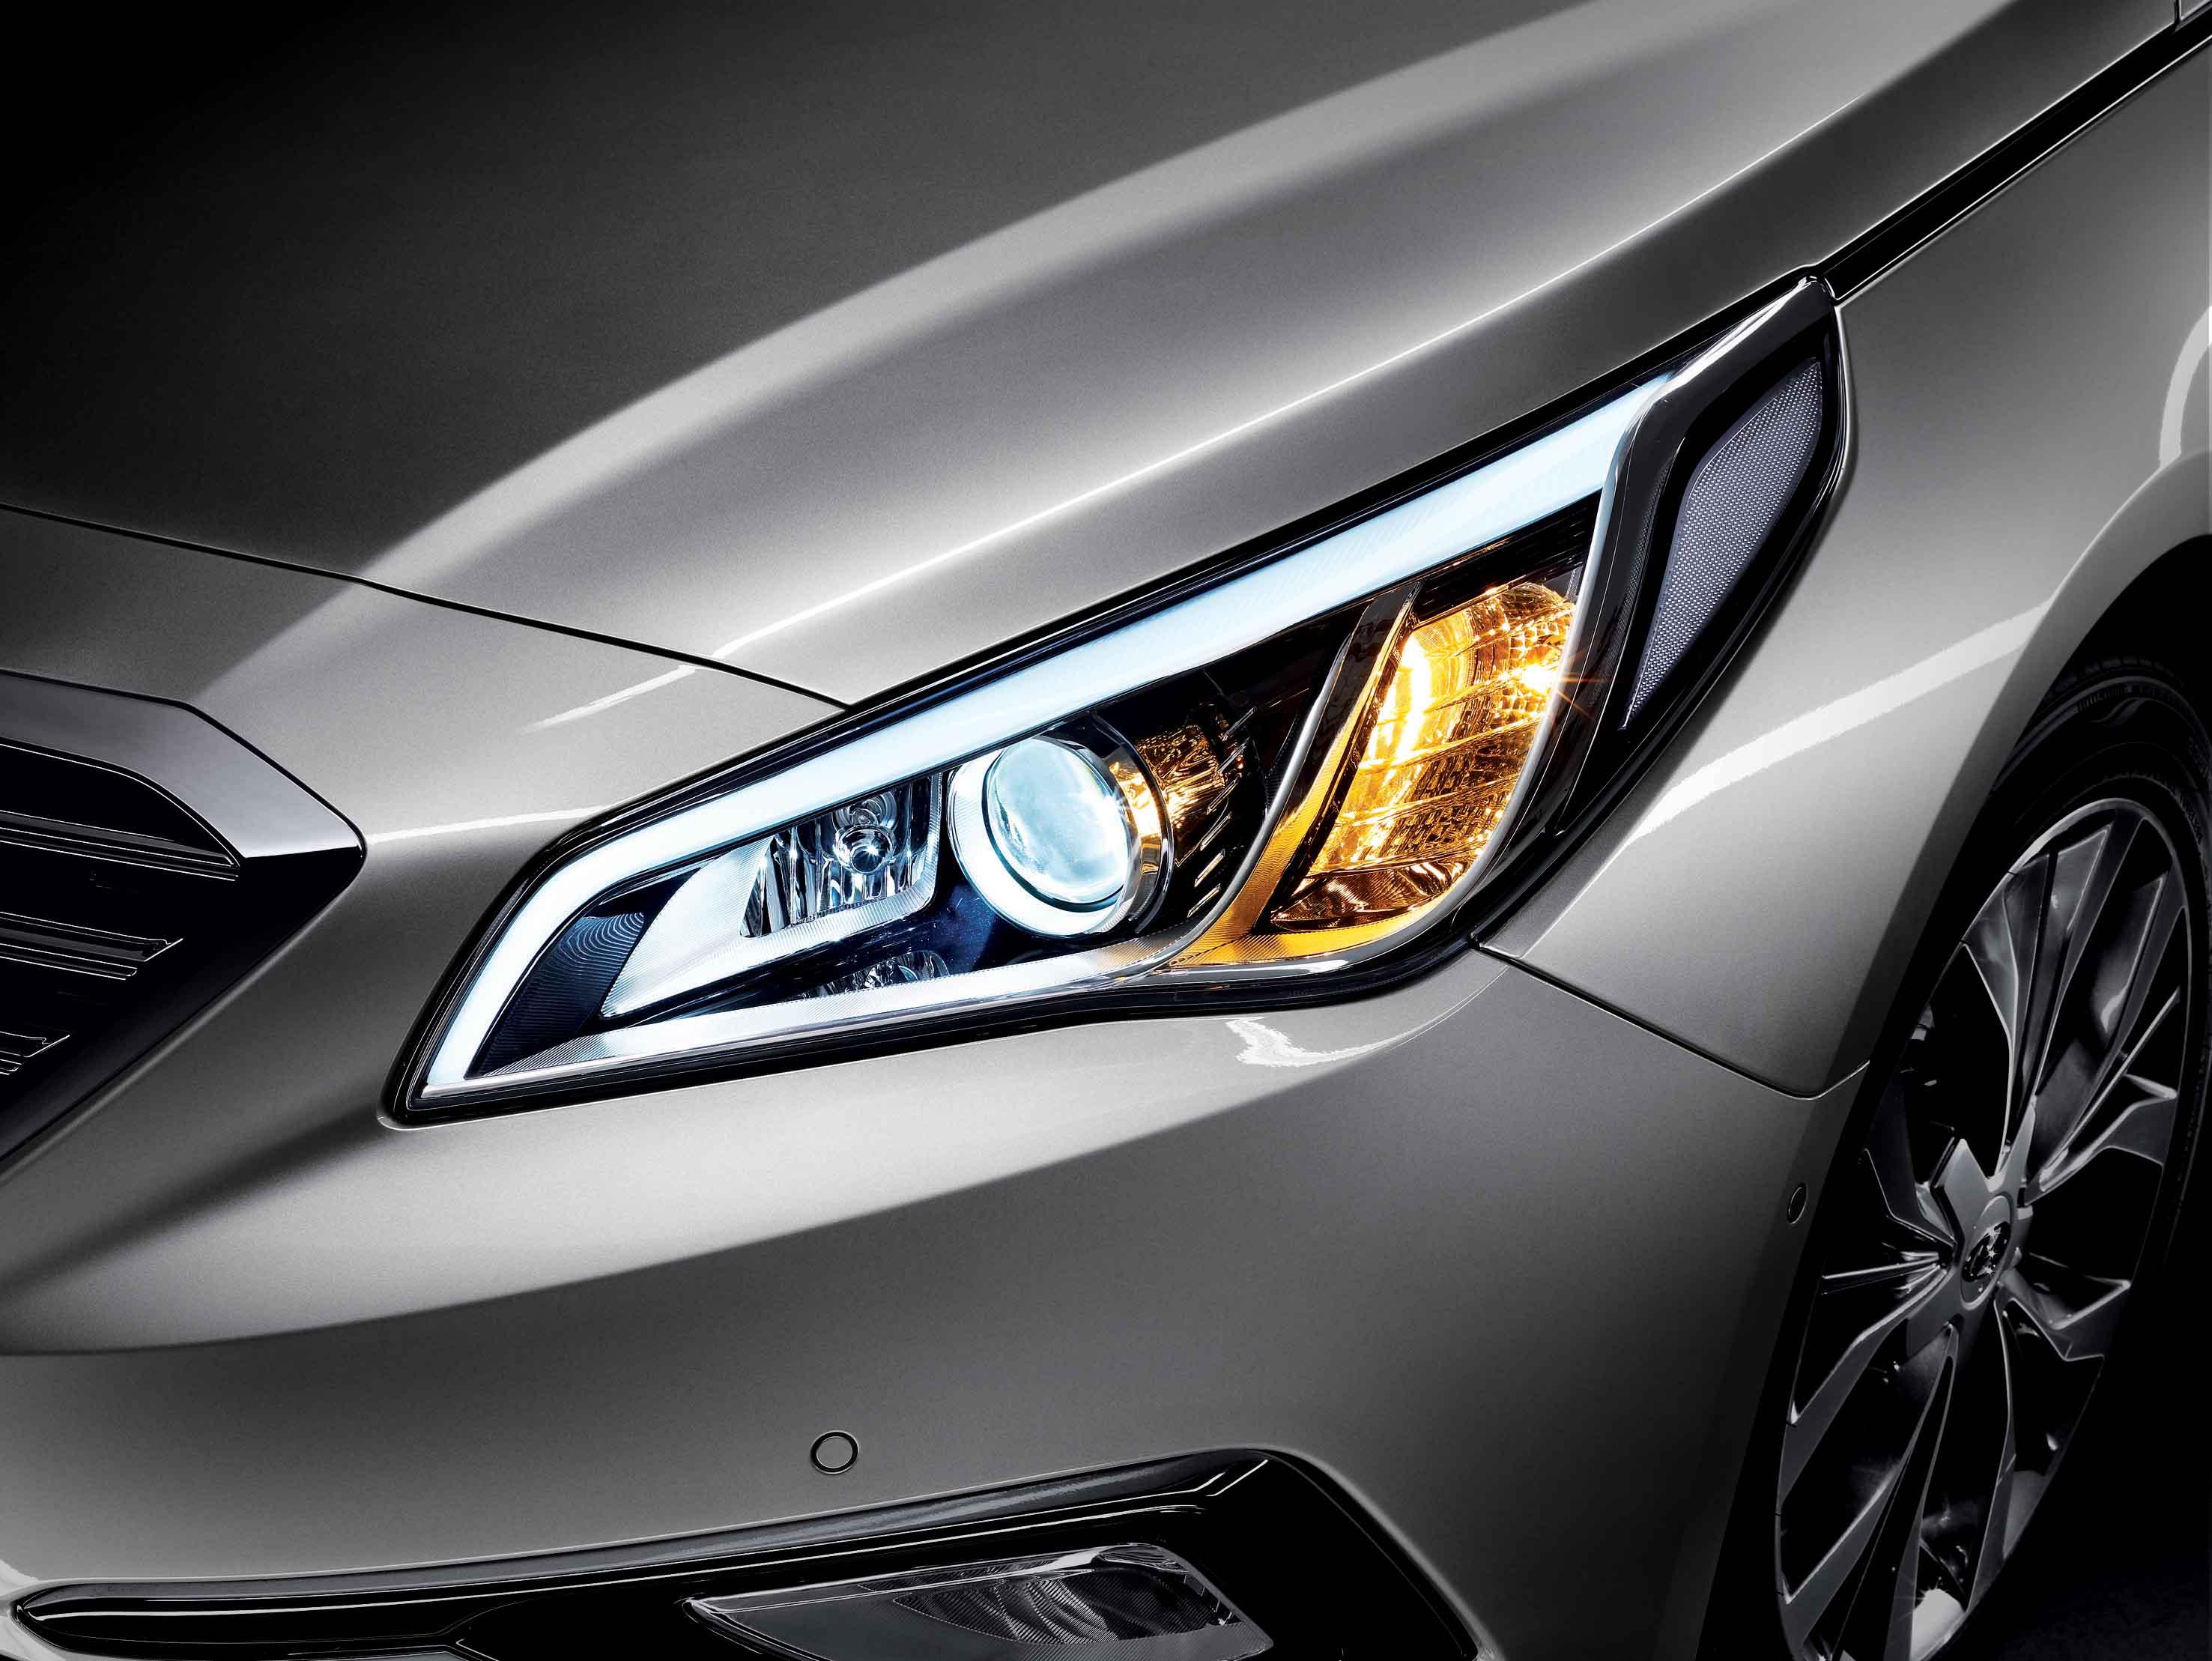 کاربرد پلیمر در صنعت خودرو